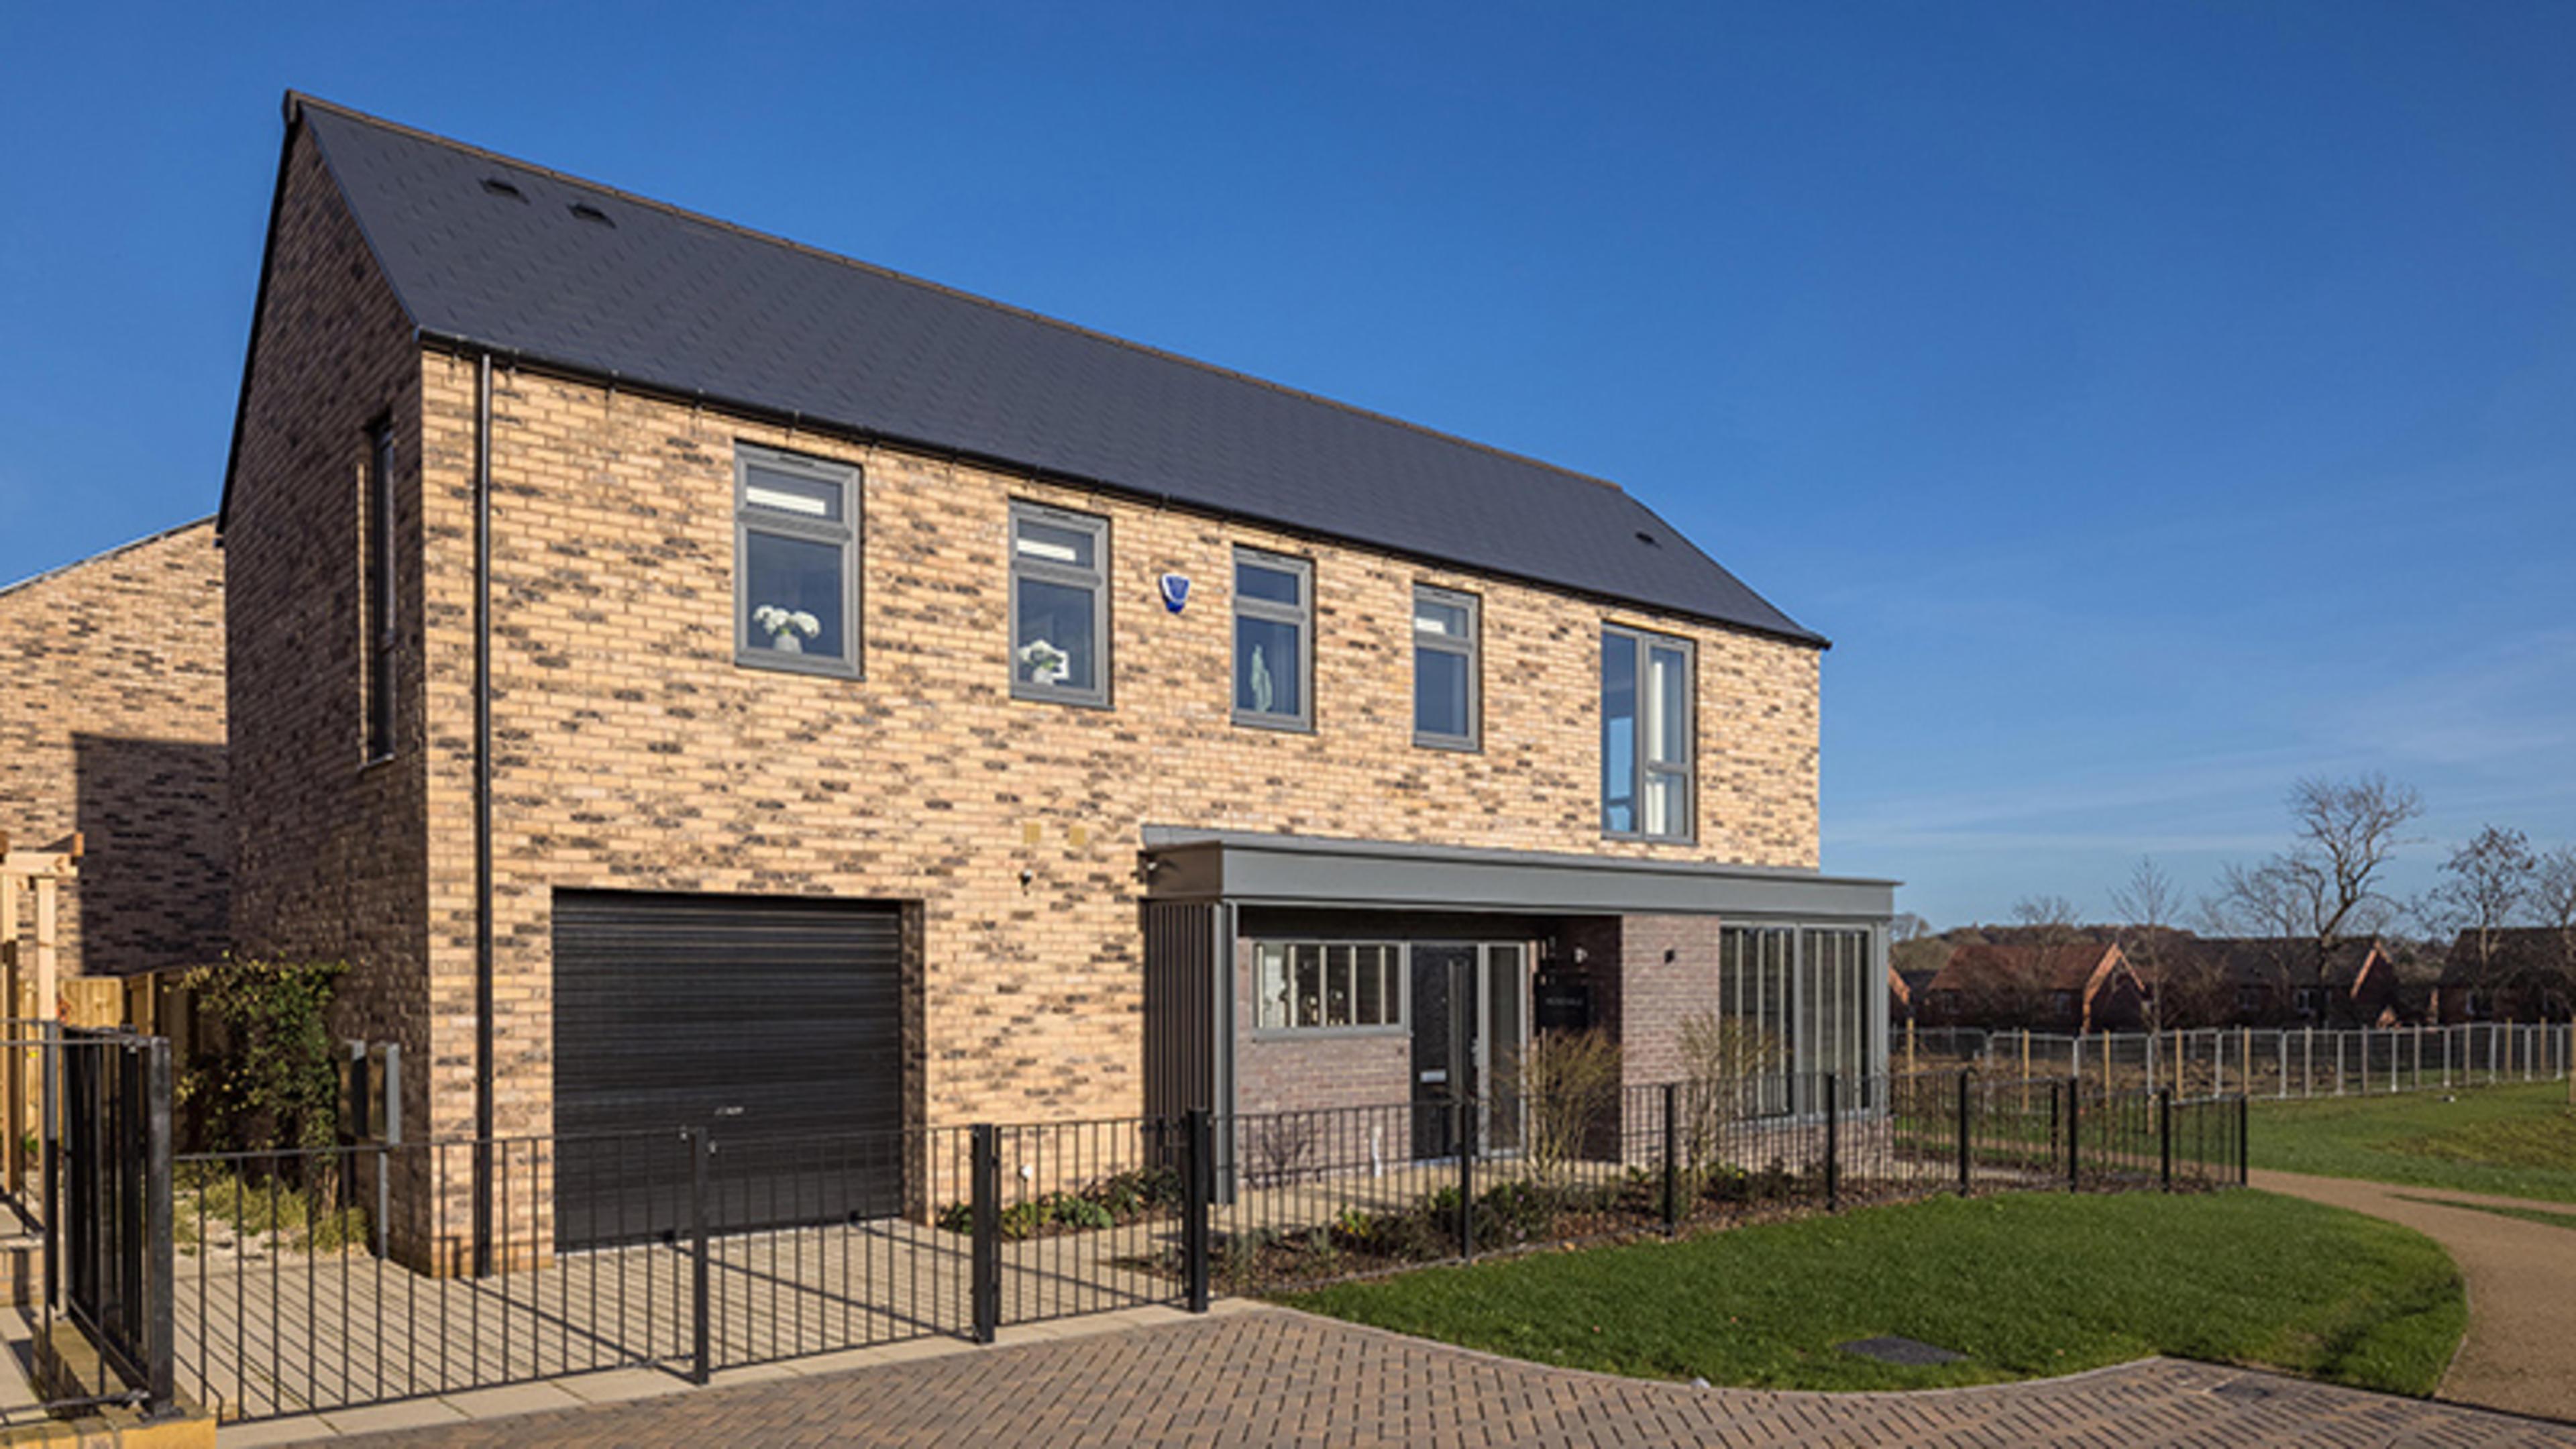 watling-grange-harrogate-merevale-4-bed-home-external-front-2